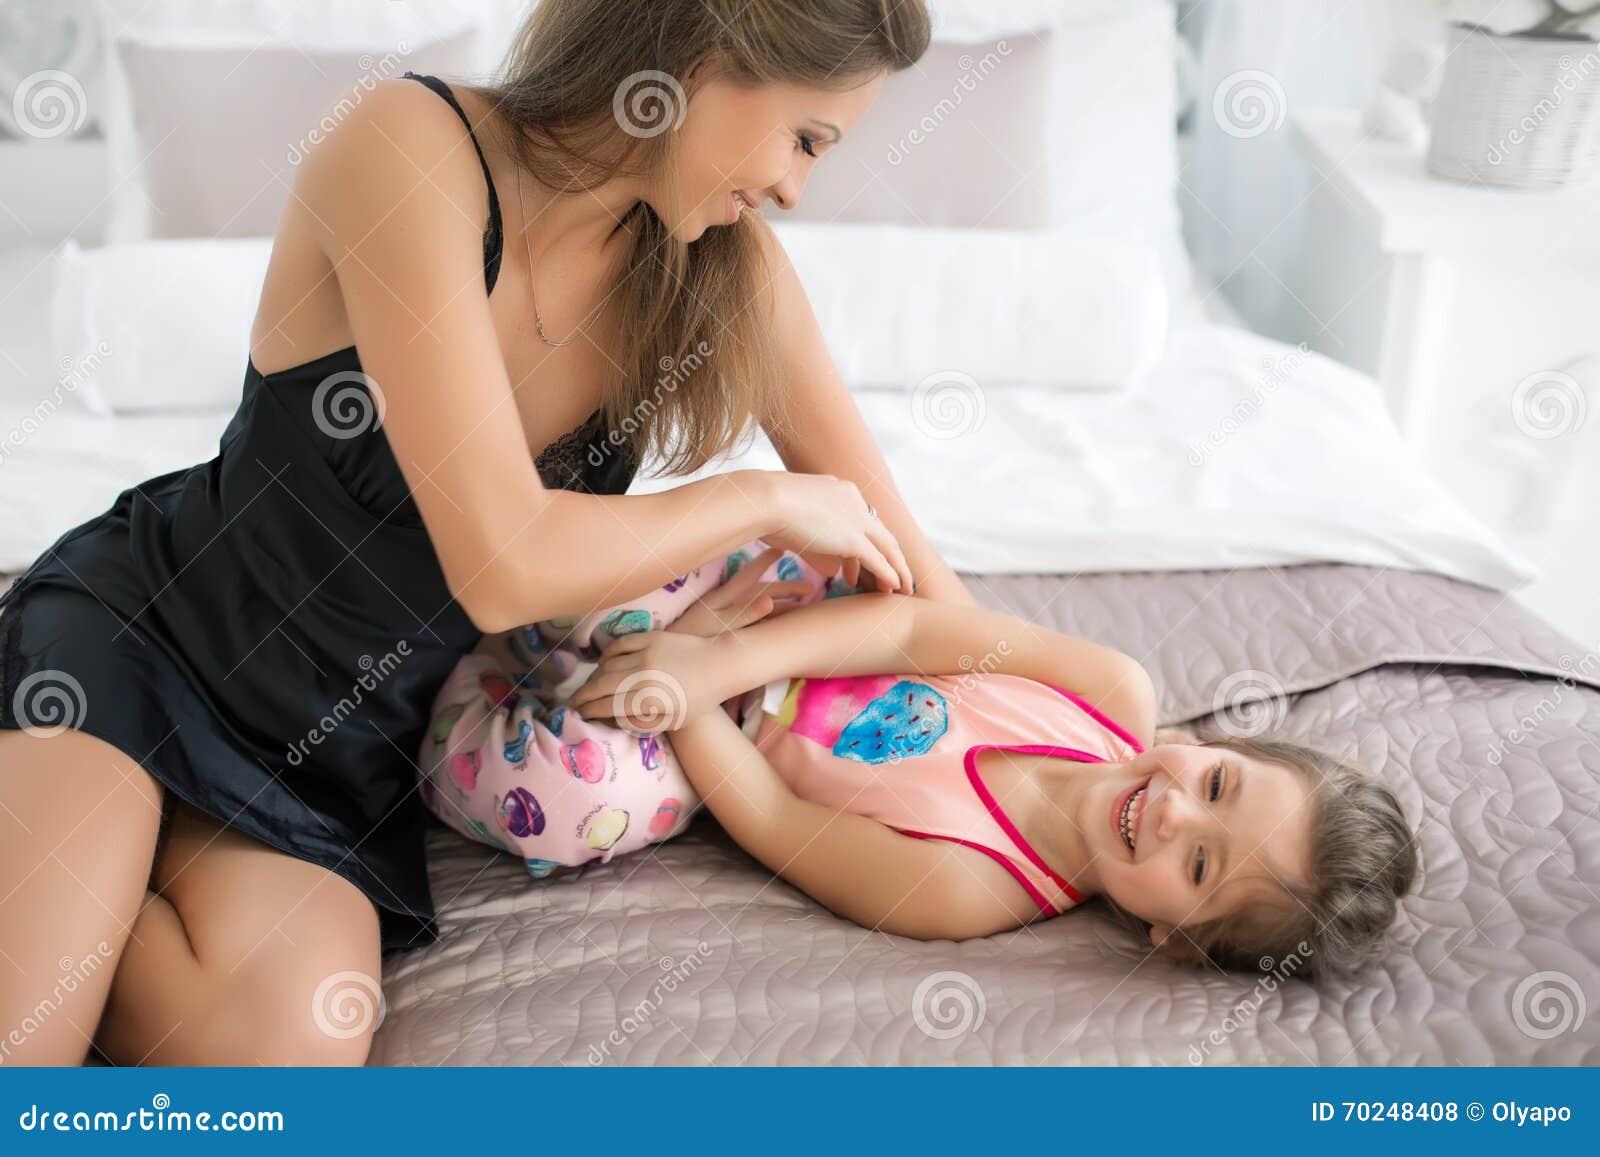 La hija los cacha